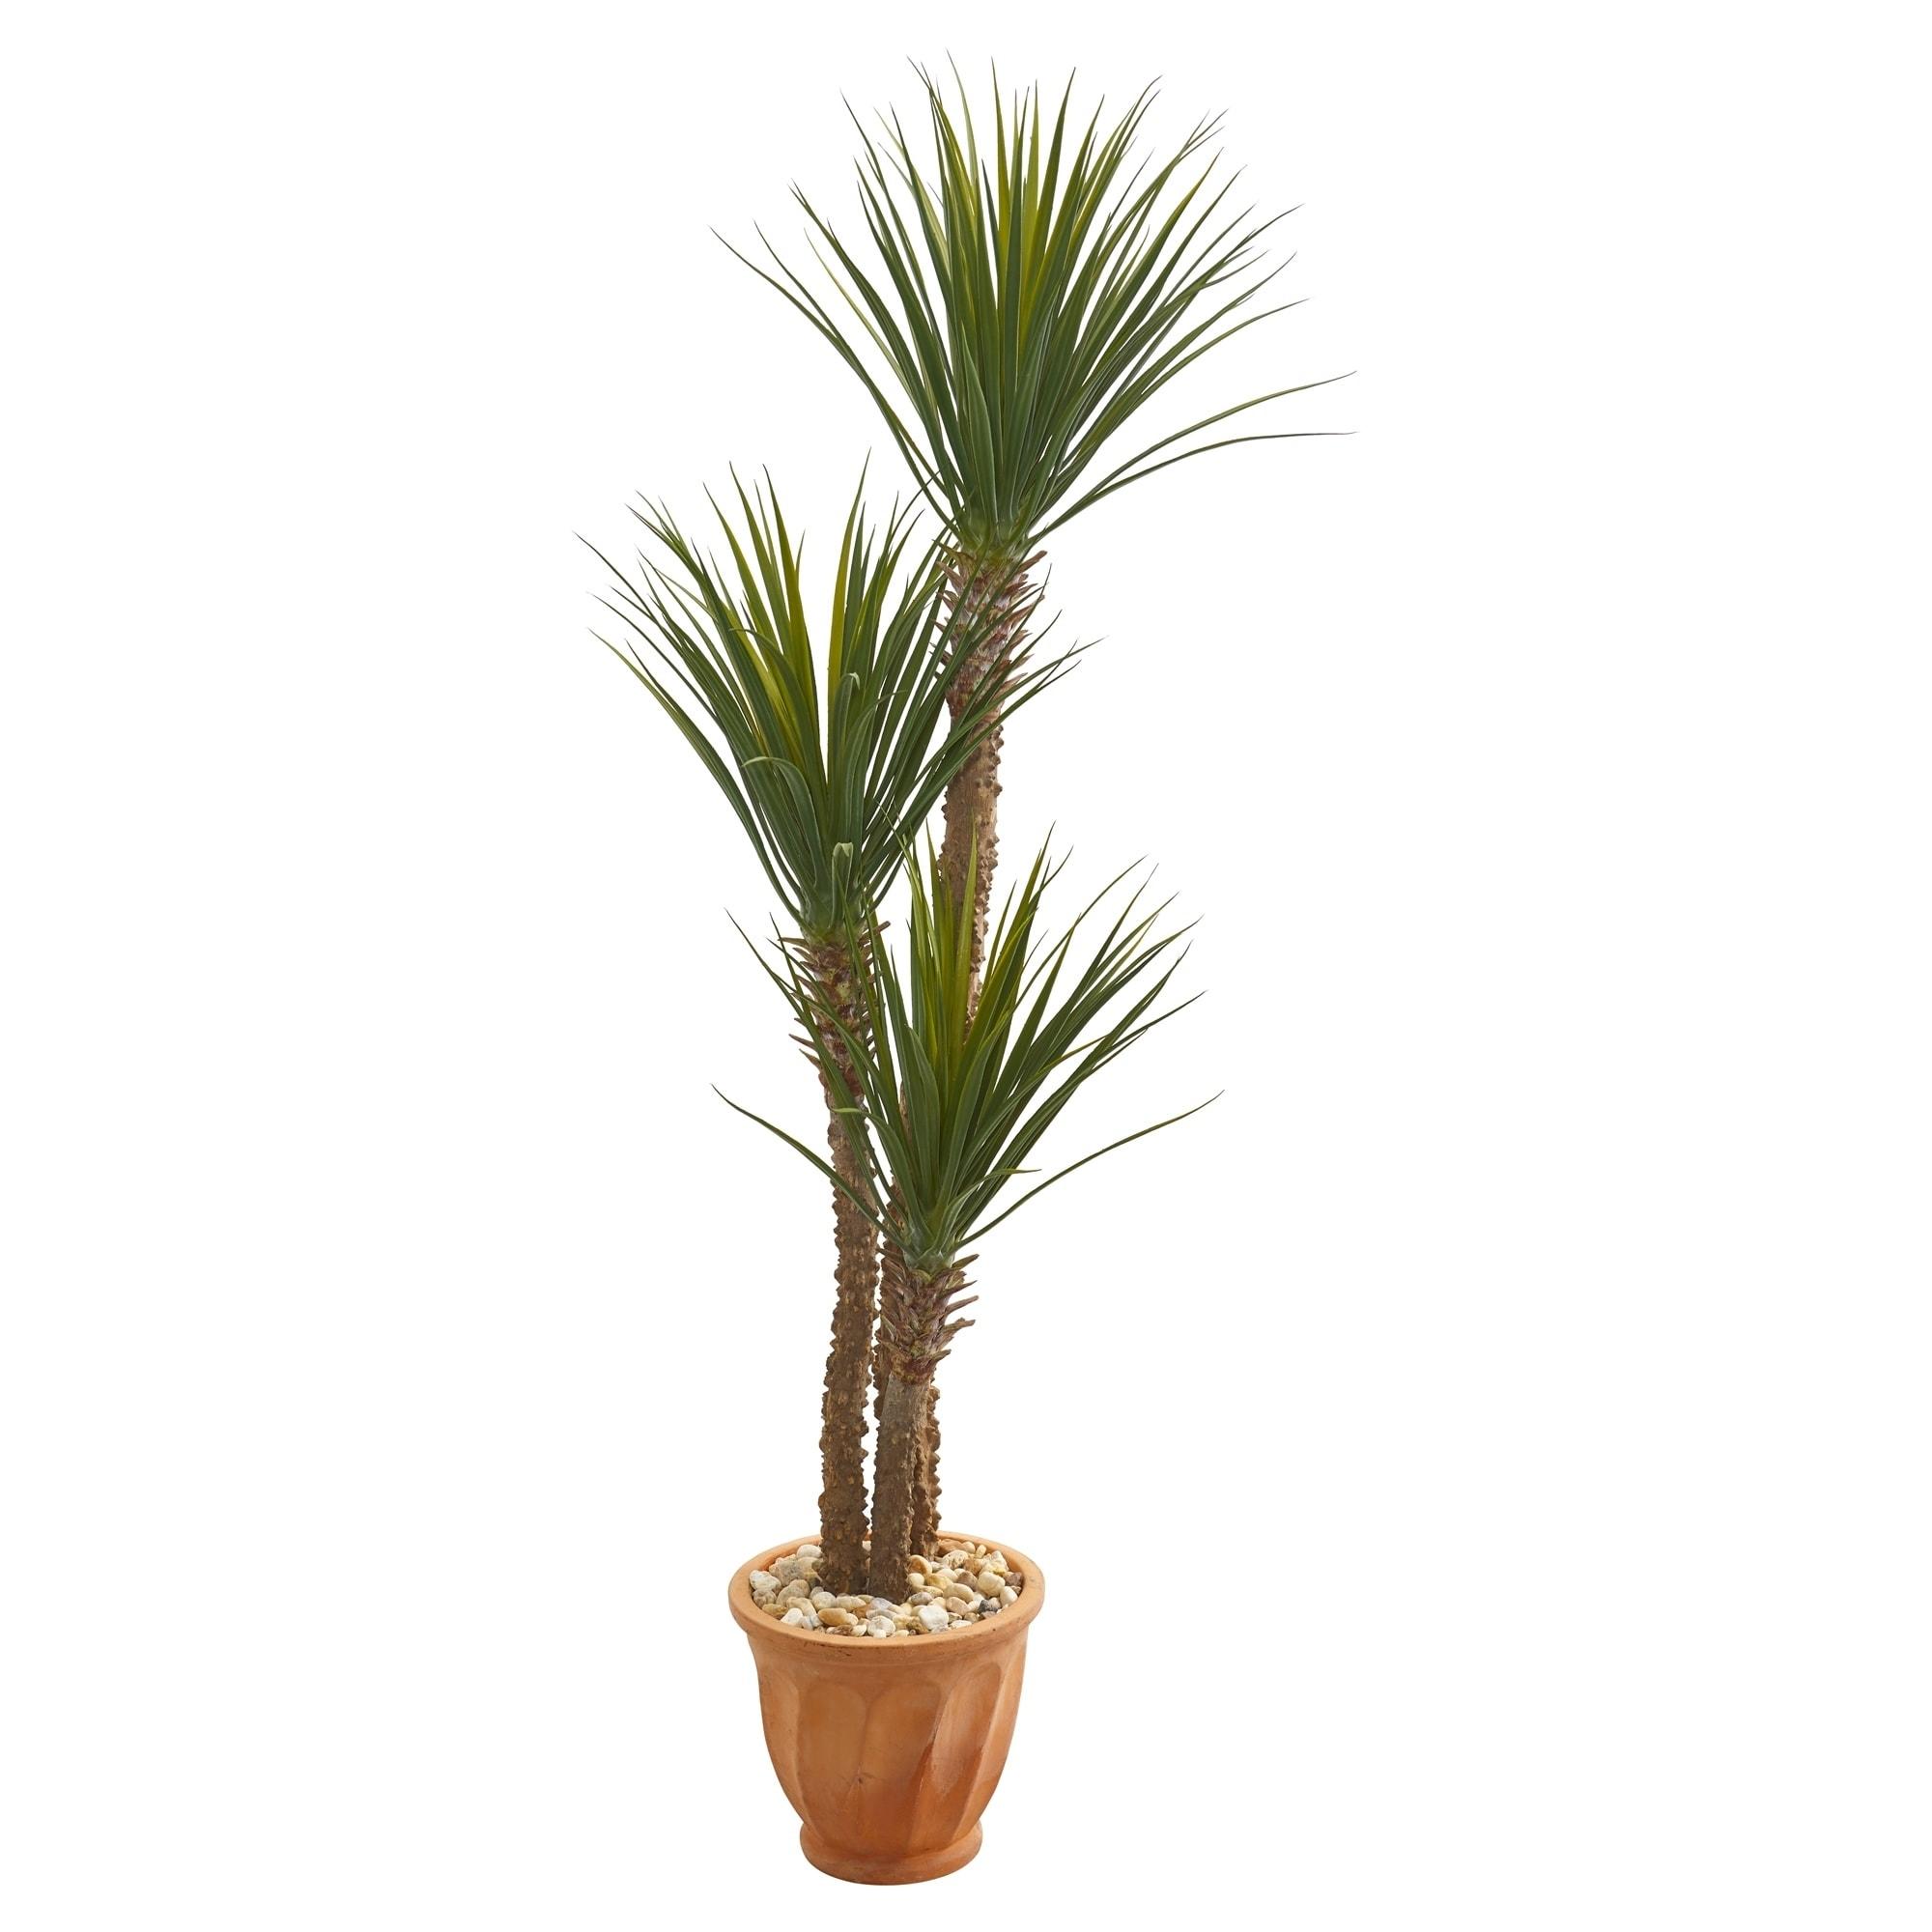 65 Yucca Rostrara Artificial Tree in Terra Cotta Planter